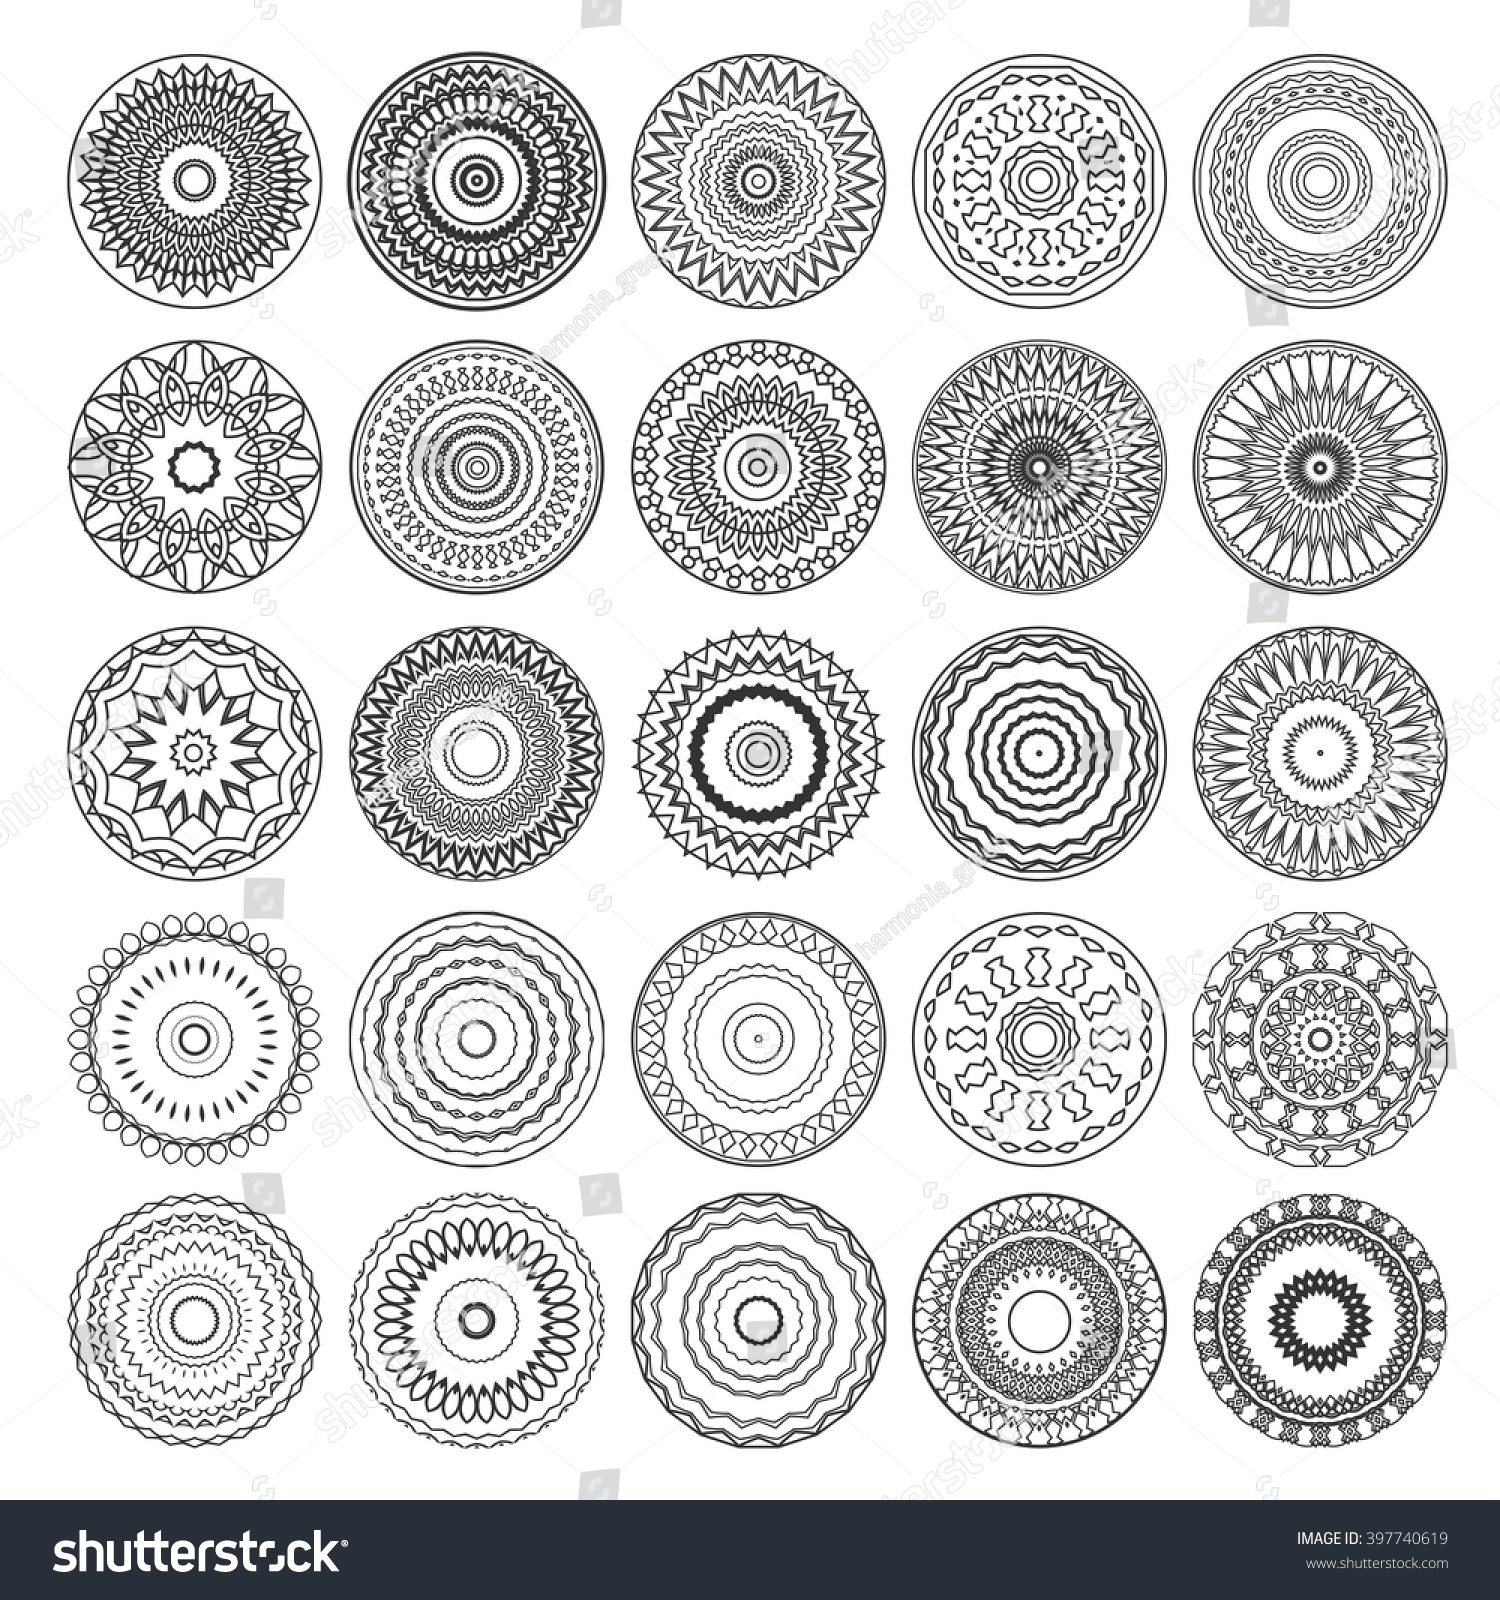 Set Circle Ornaments Mandalas Vector Mandala Stock Vector (Royalty ...